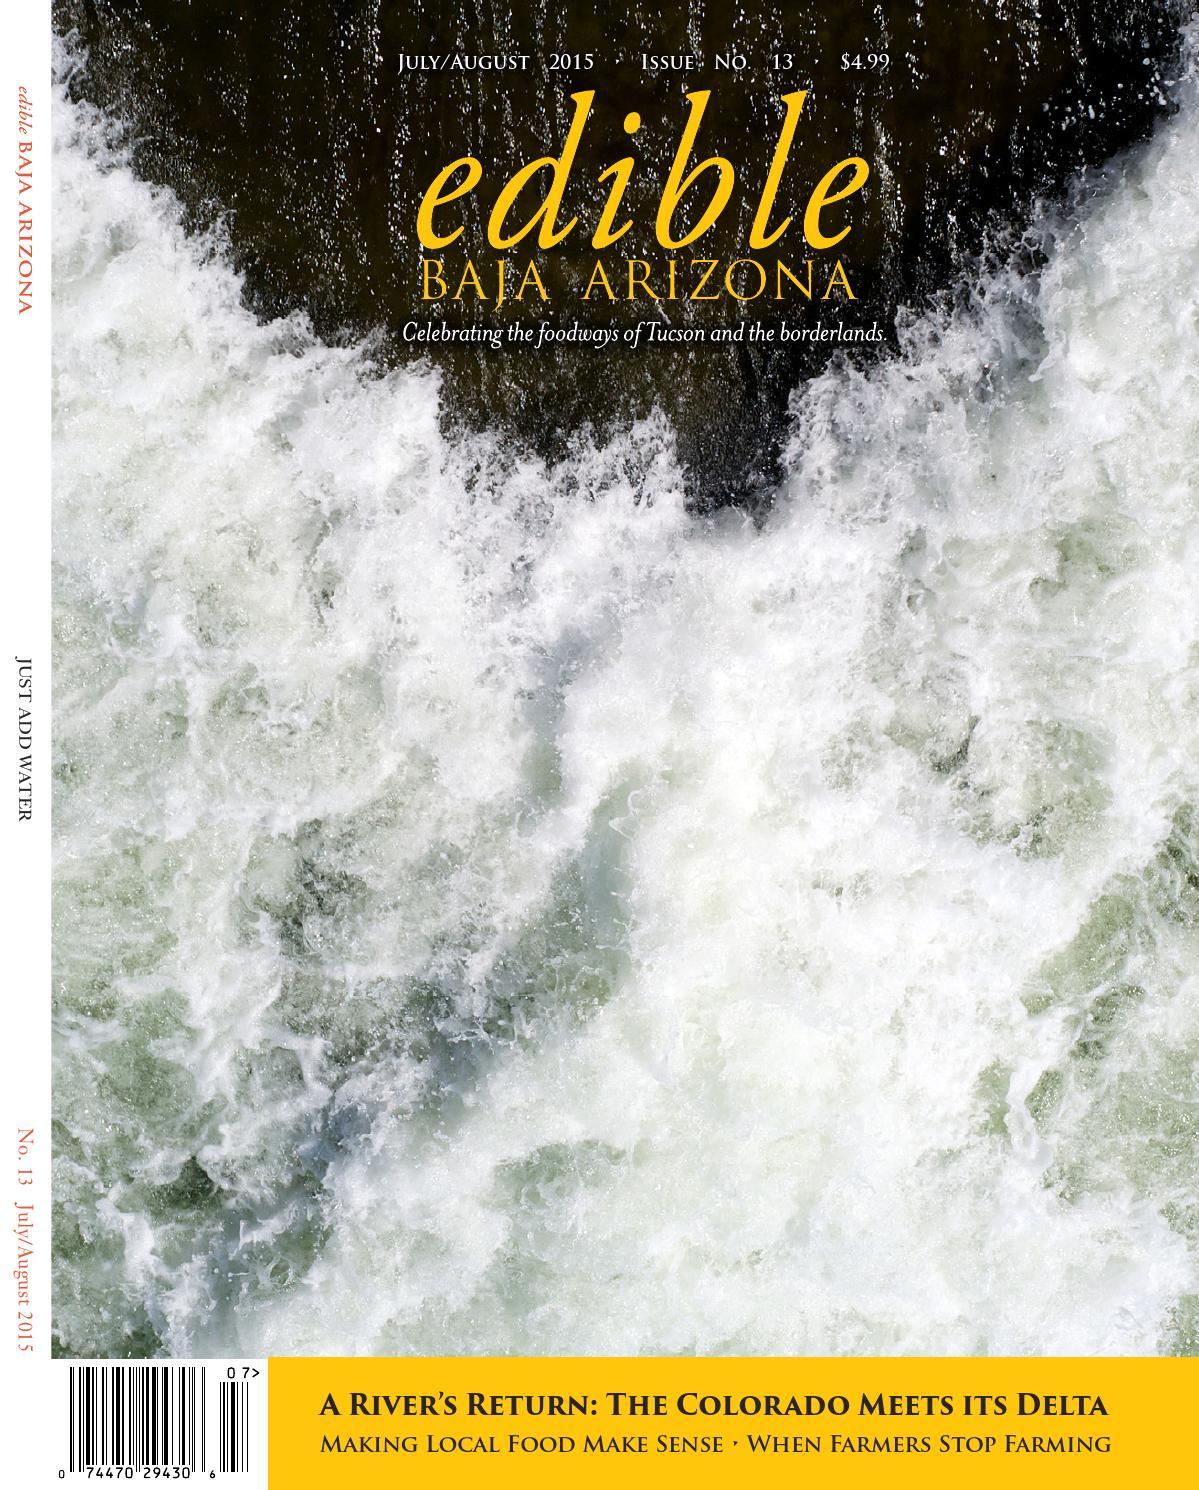 Edible Baja Arizona - July/August 2015 by Edible Baja Arizona - issuu